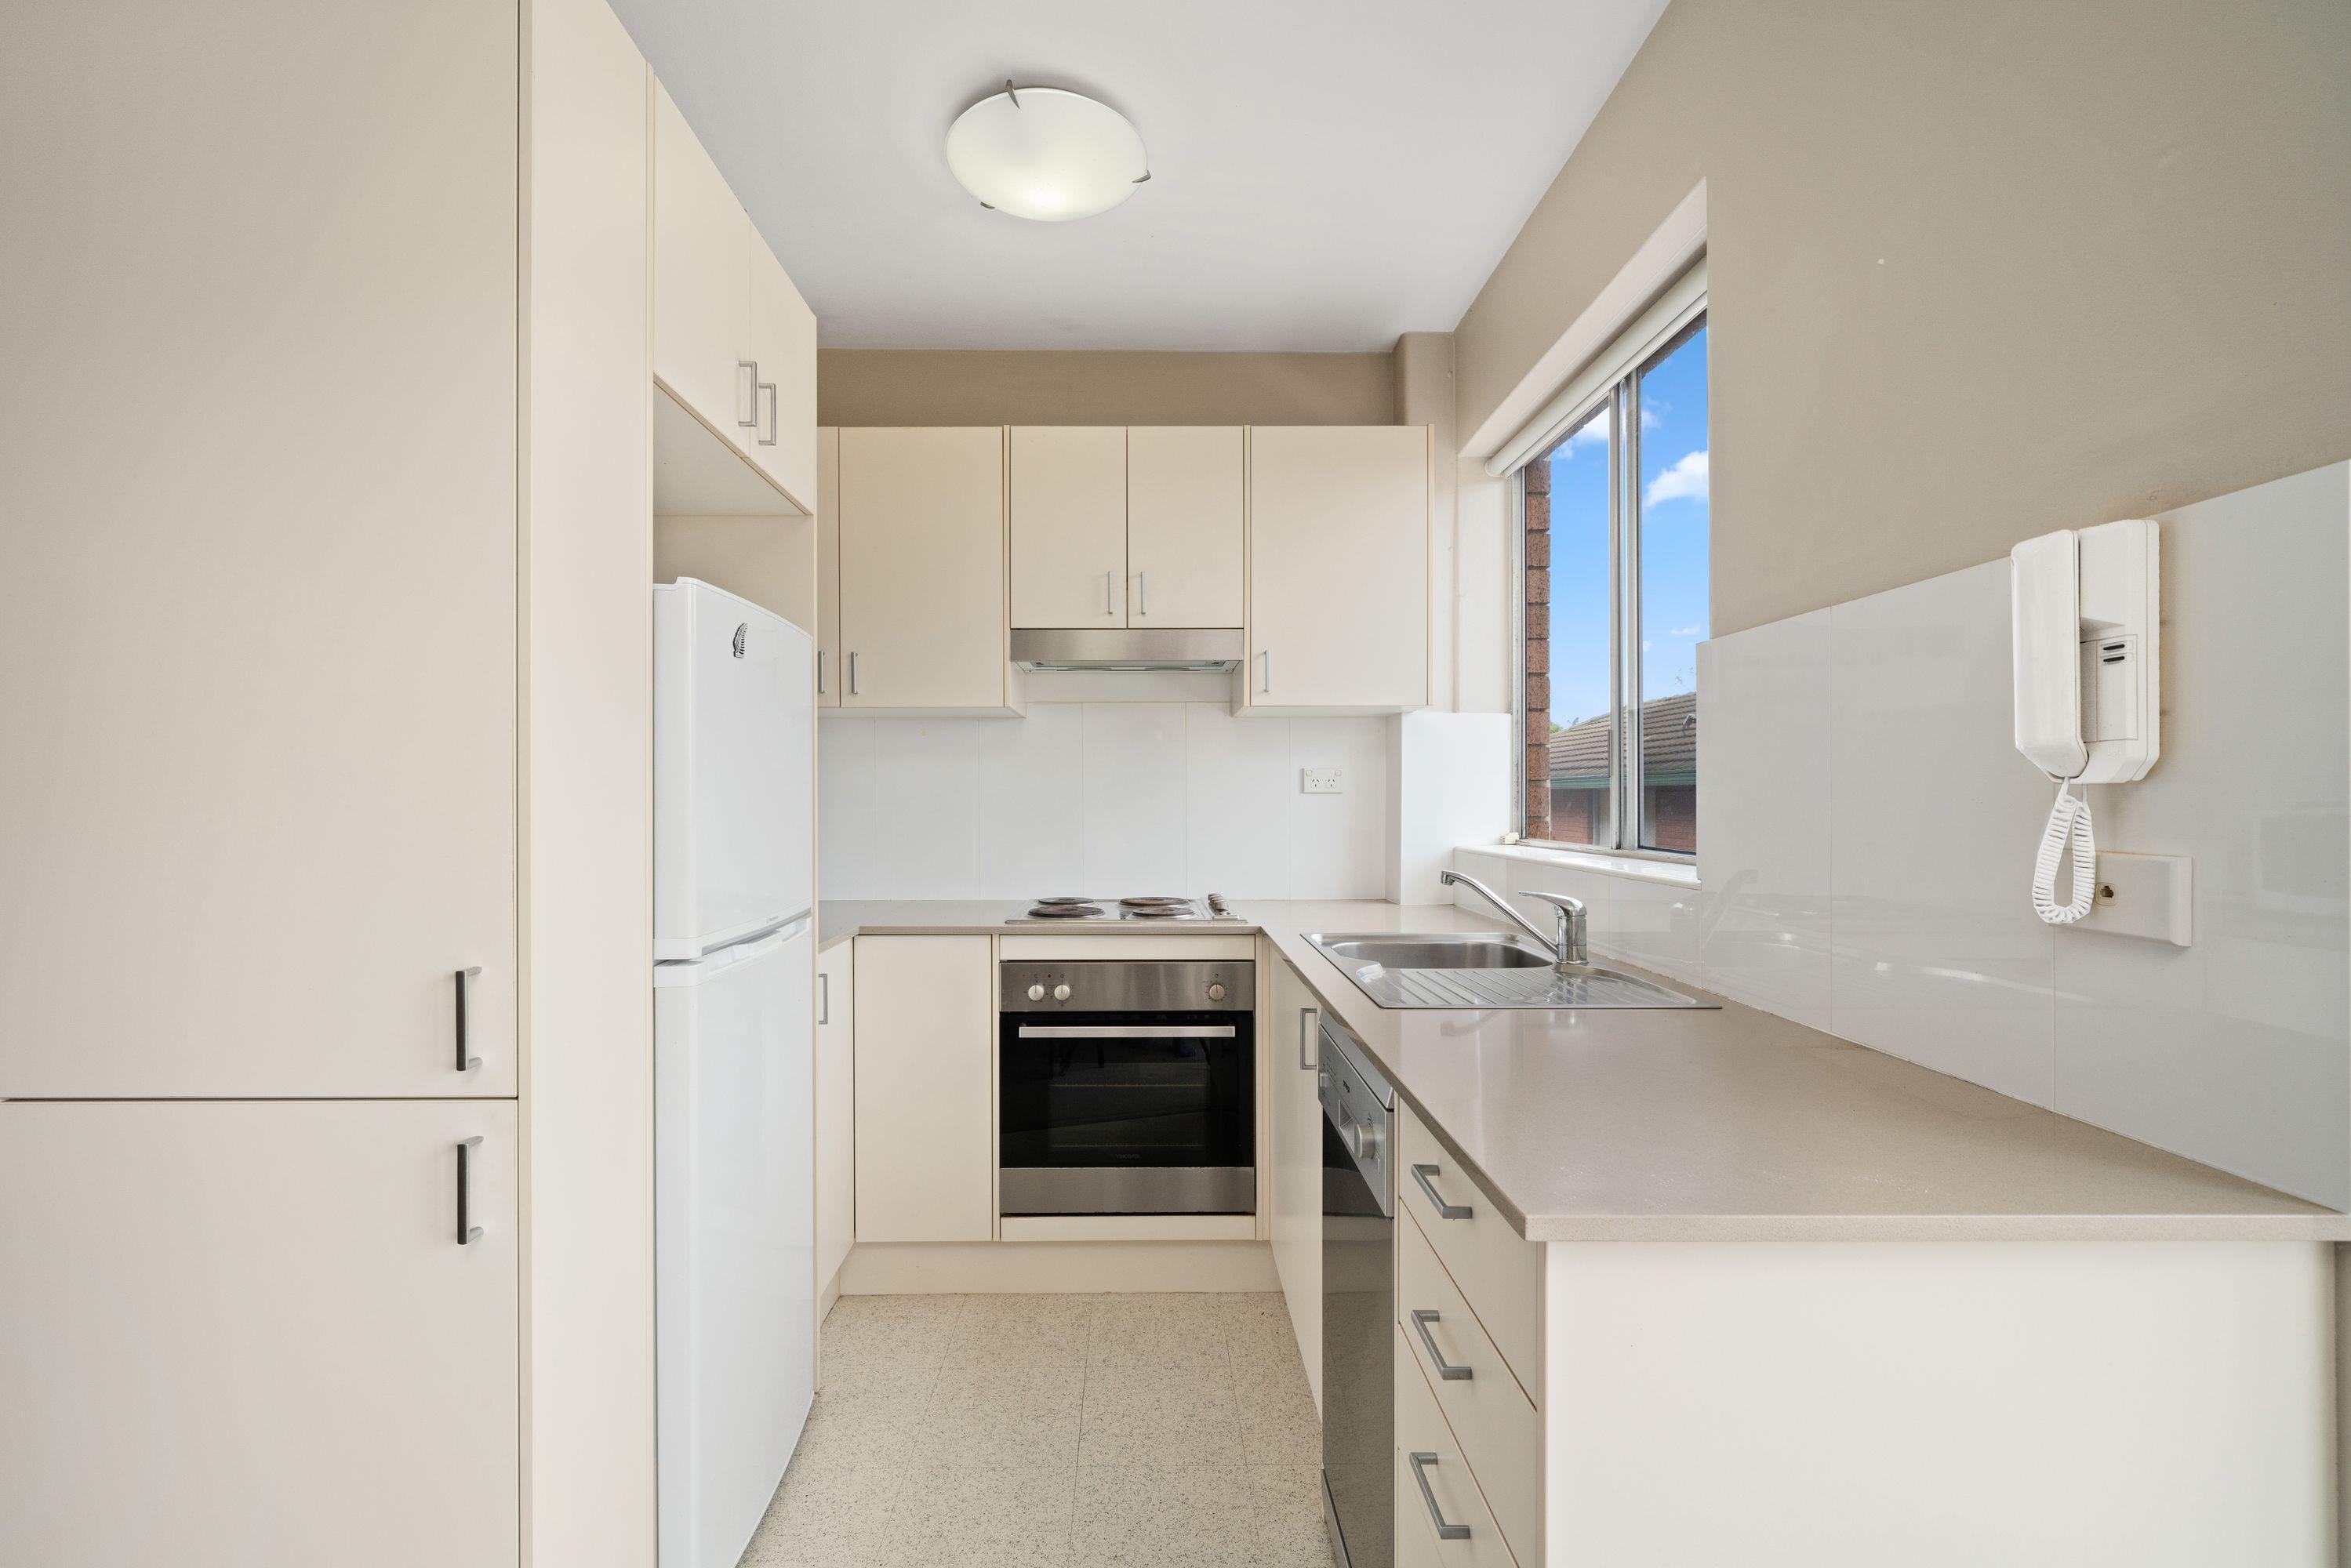 13/21 Pearson Street, Gladesville, NSW 2111